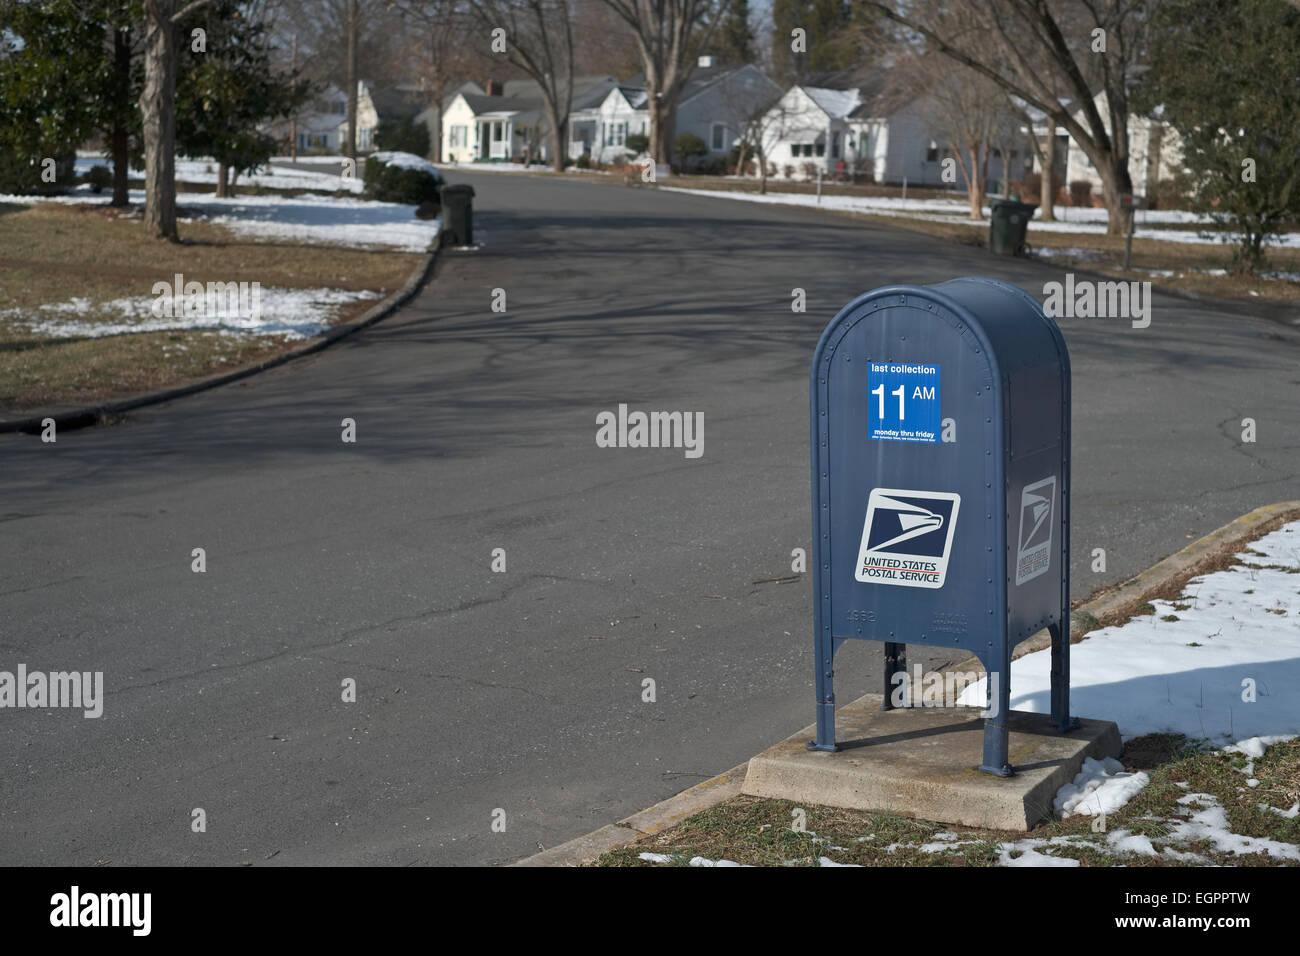 Blue Postal Mailbox Residential Collection Postal Box Stock Photo Alamy